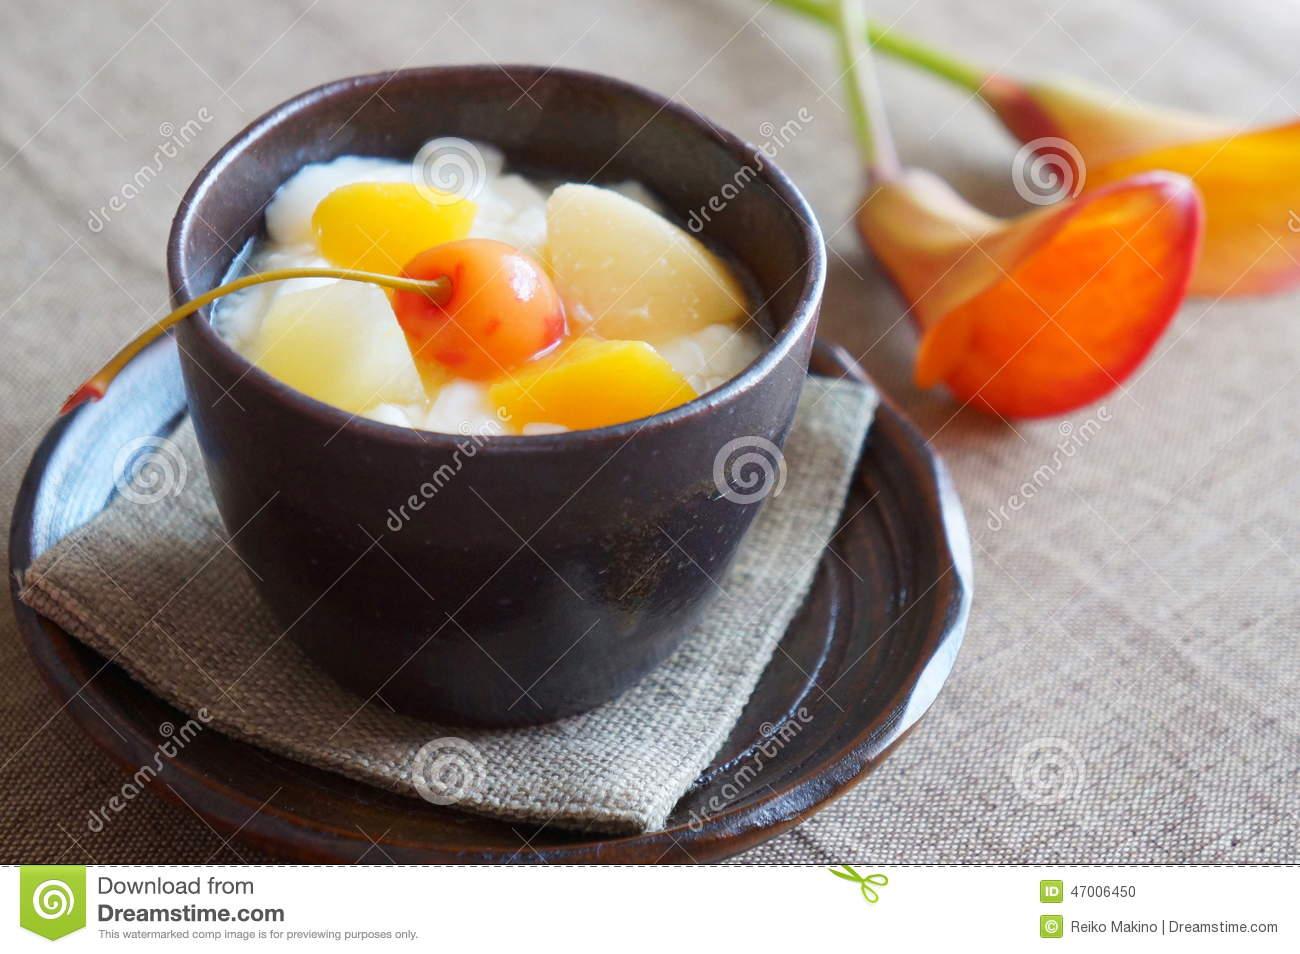 Chinese Almond Gelatin Dessert Royalty Free Stock Photos.